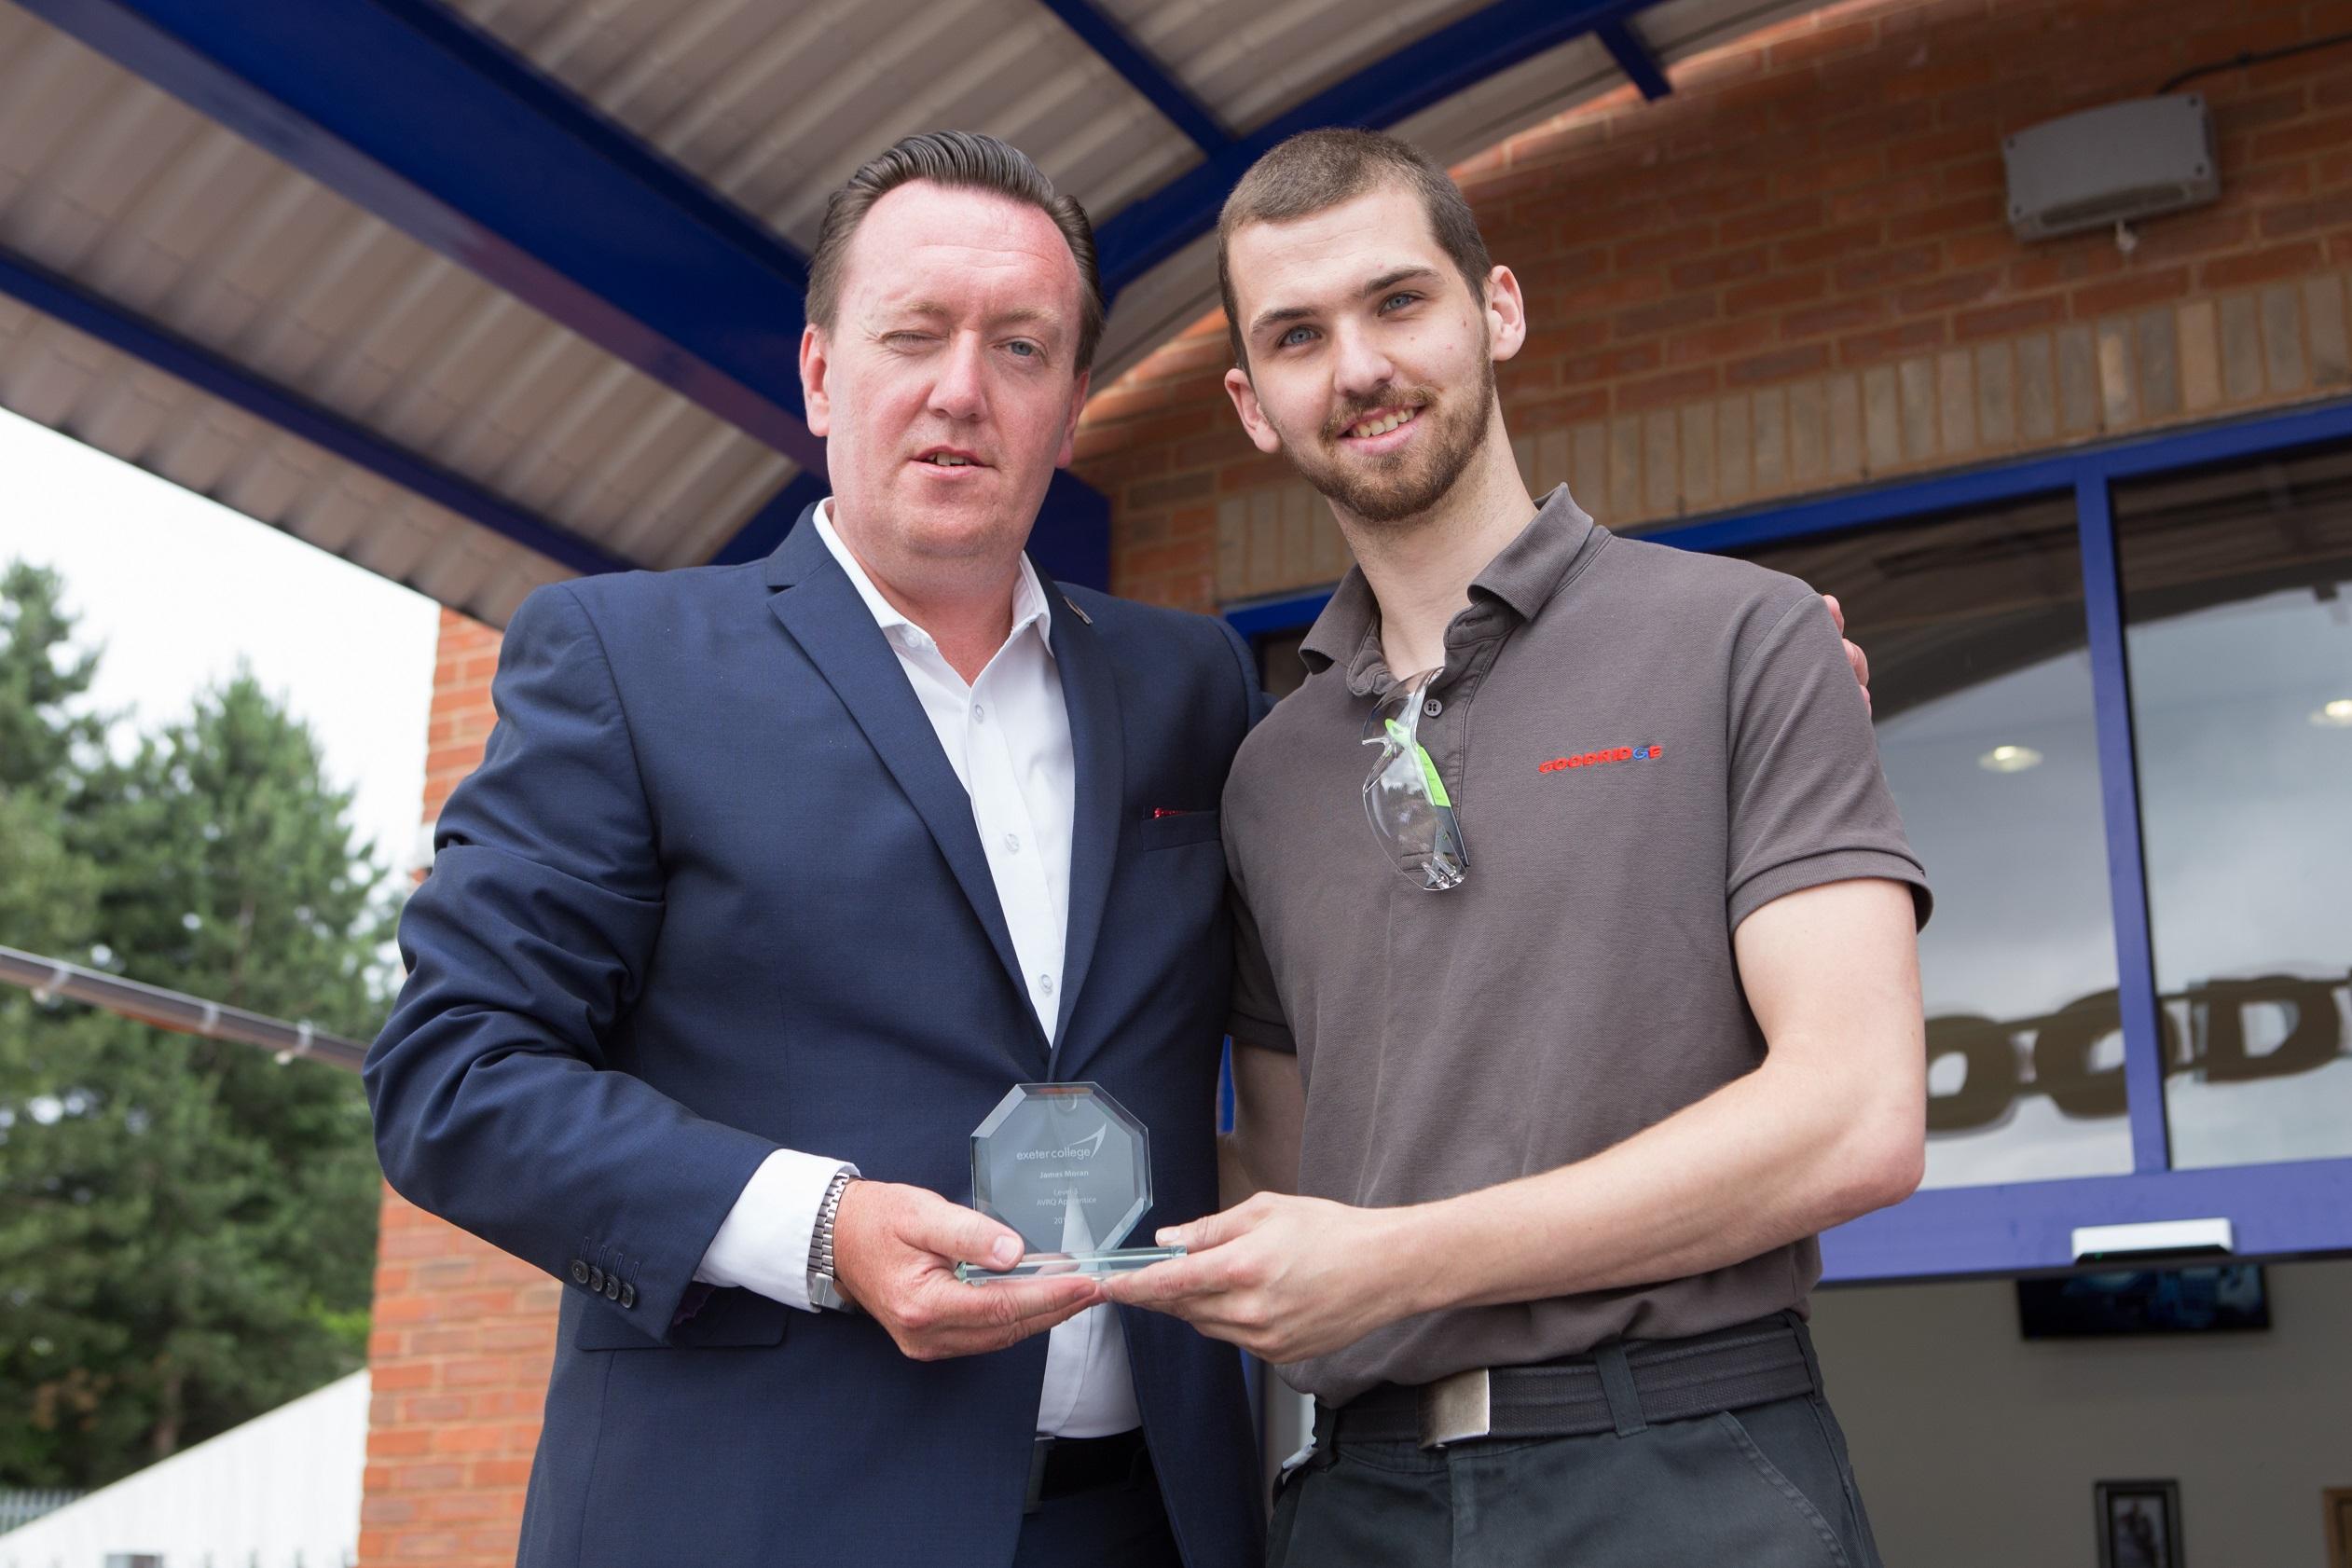 Junior Engineer James Moran presented Exeter College Award